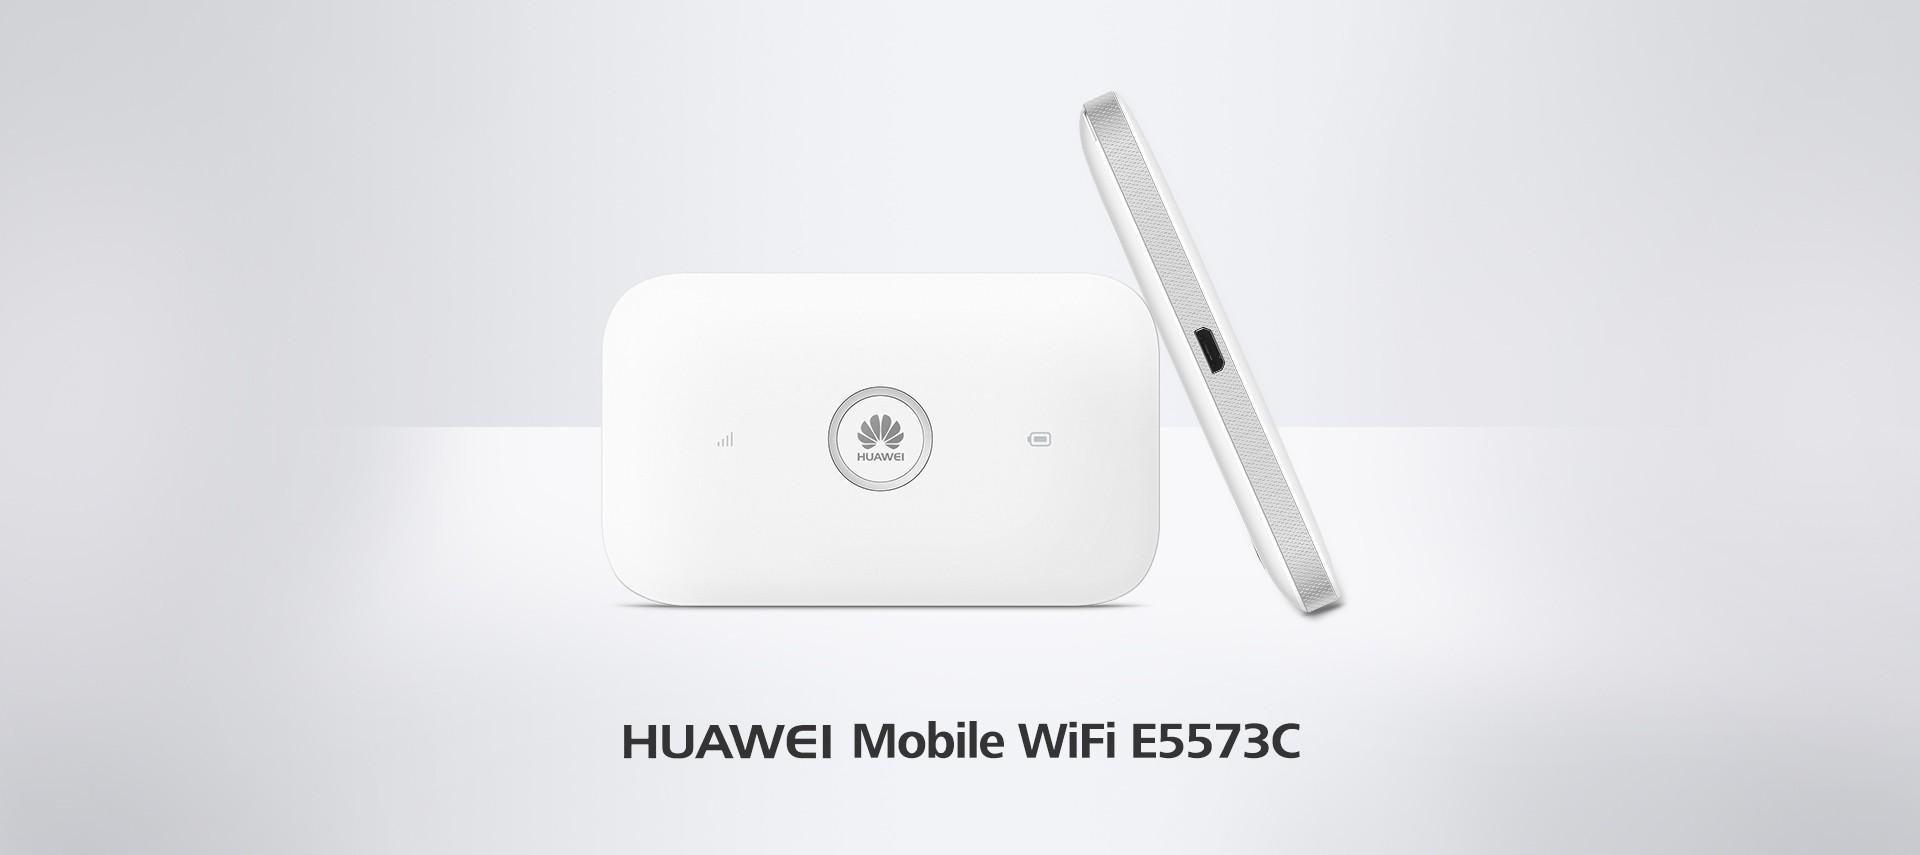 E5573C | Mobile Wifi | HUAWEI United Kingdom